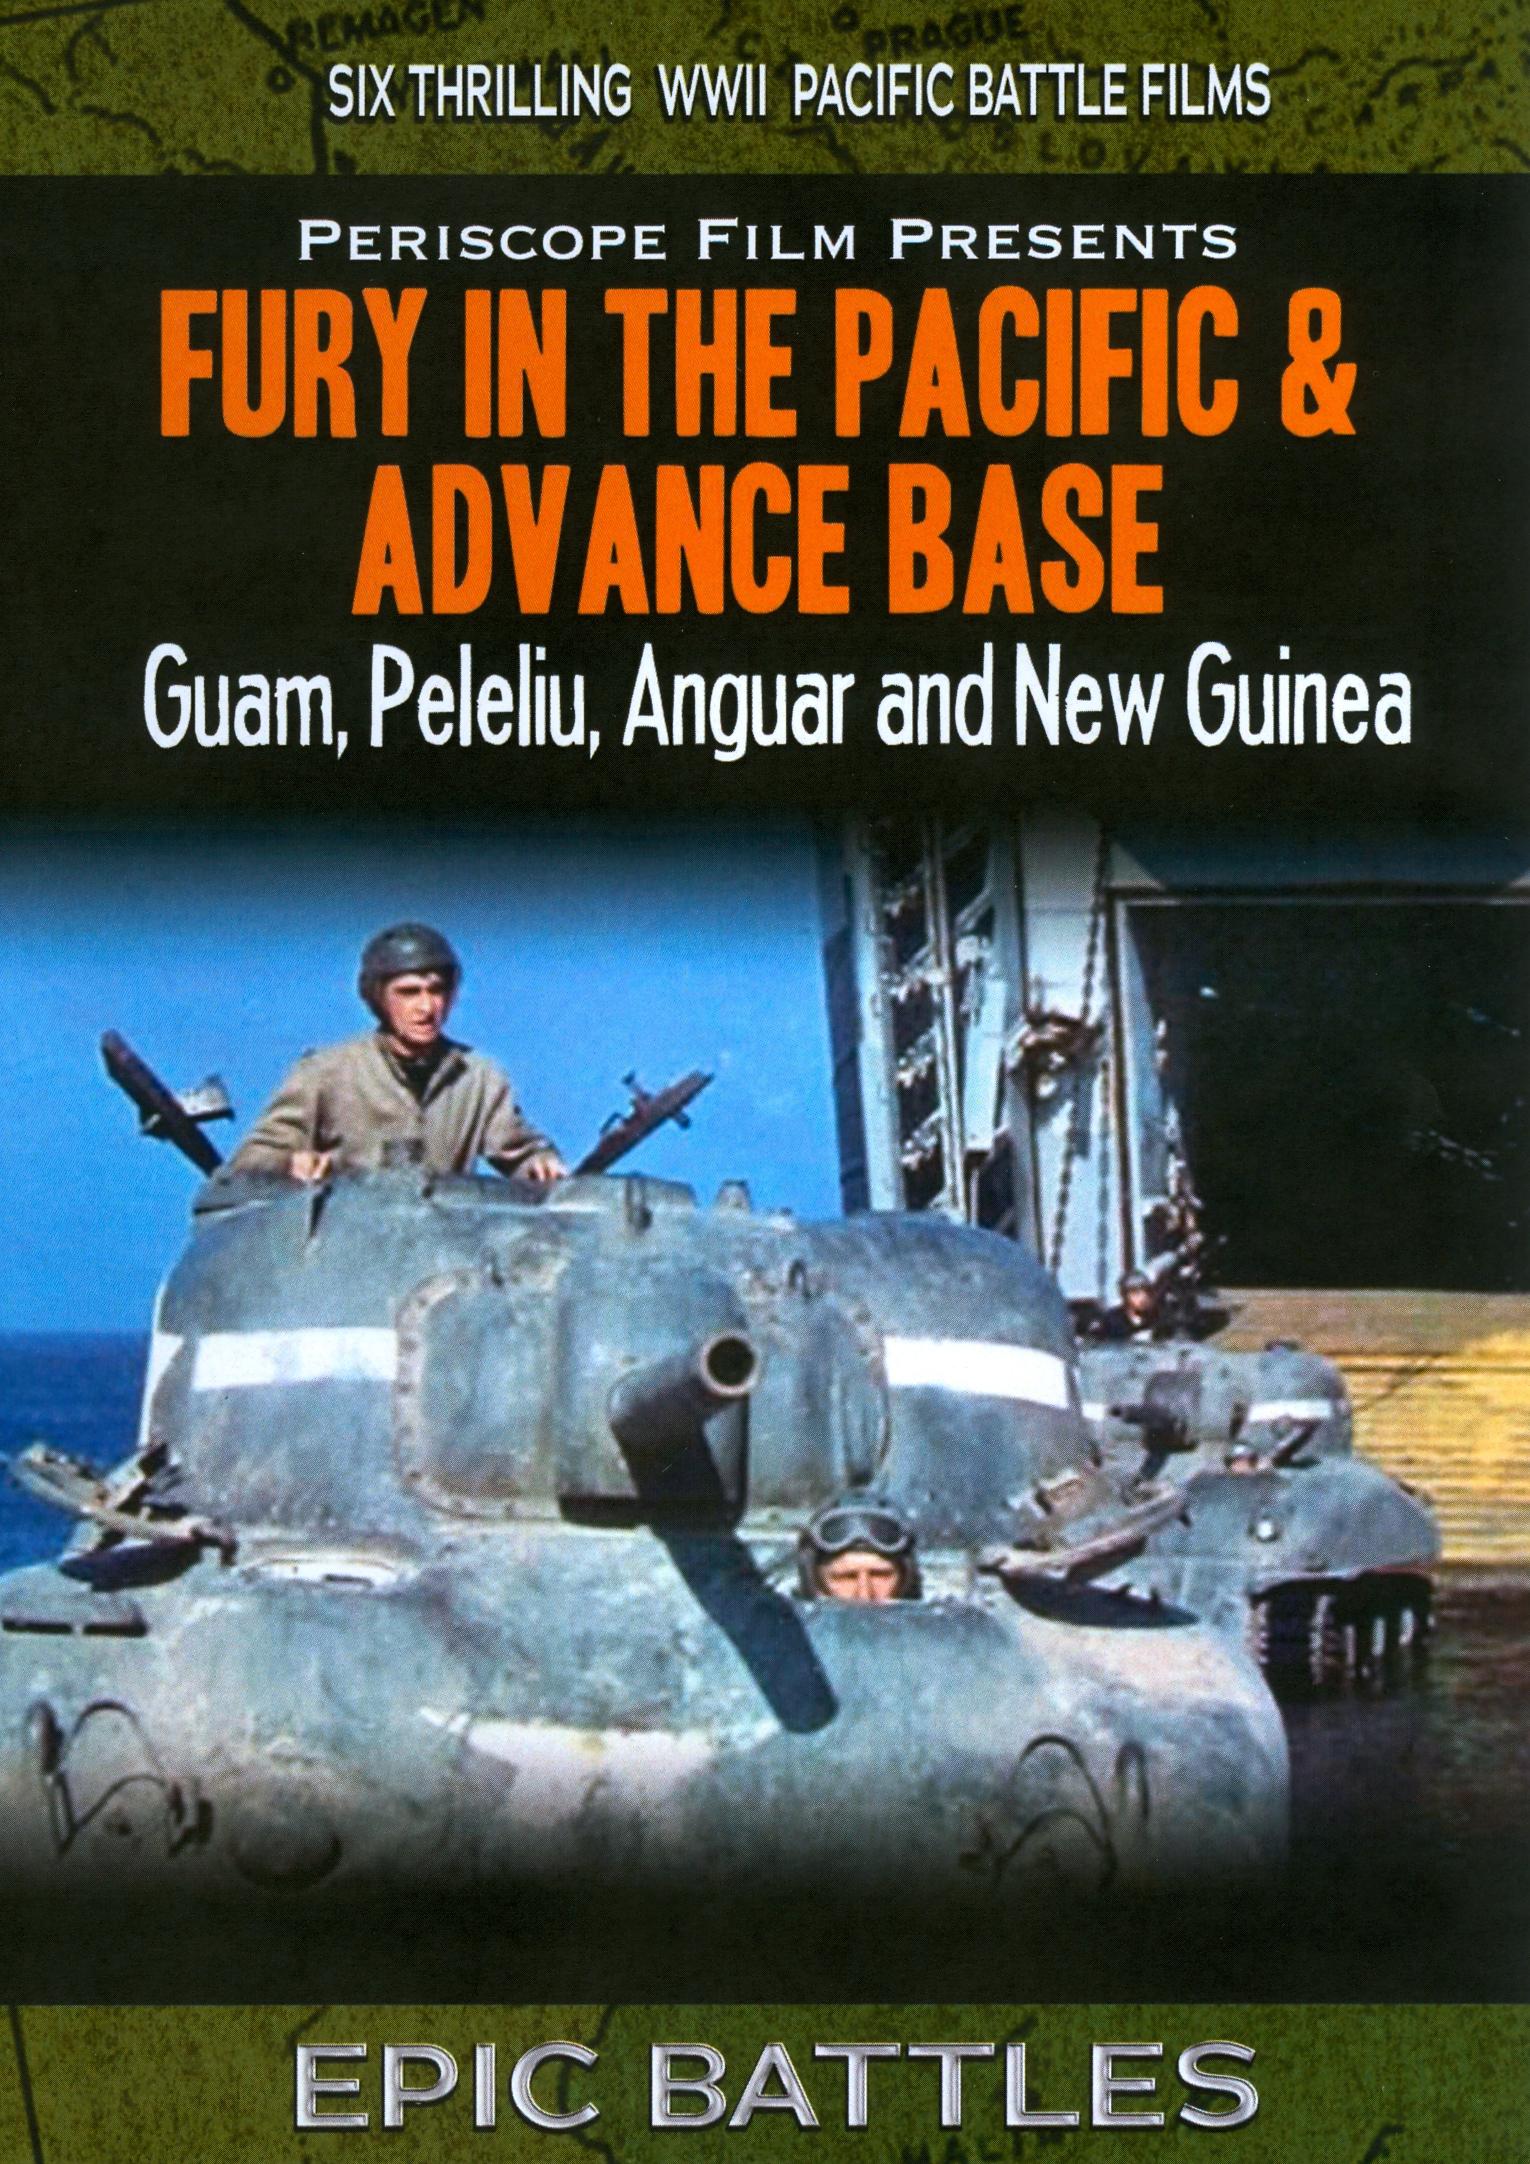 Fury in the Pacific & Advance Base: Guam, Peleliu, Anguar and New Guinea